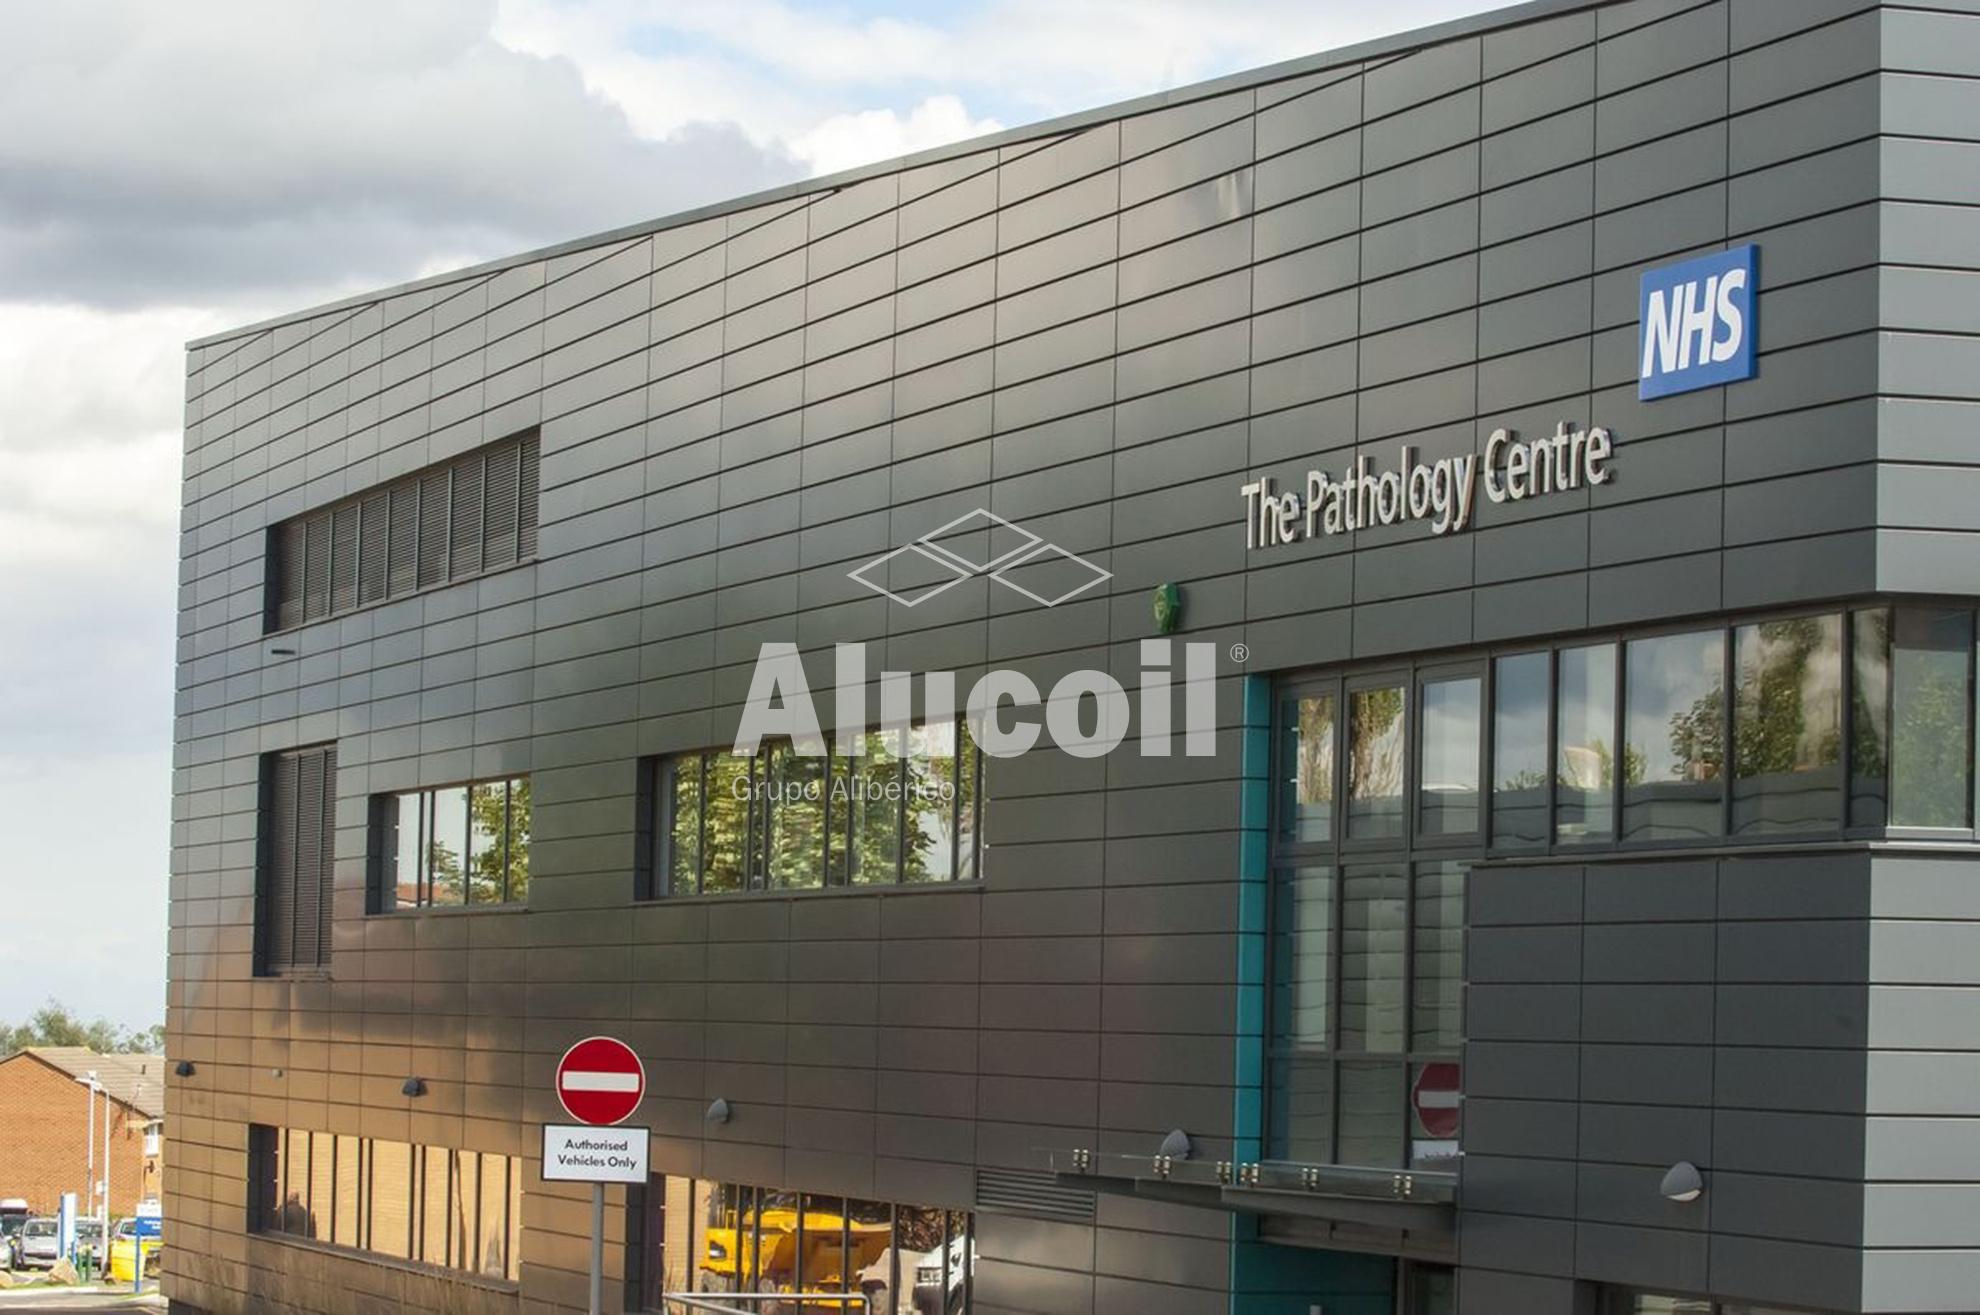 The Pathology centre at QE Gateshead